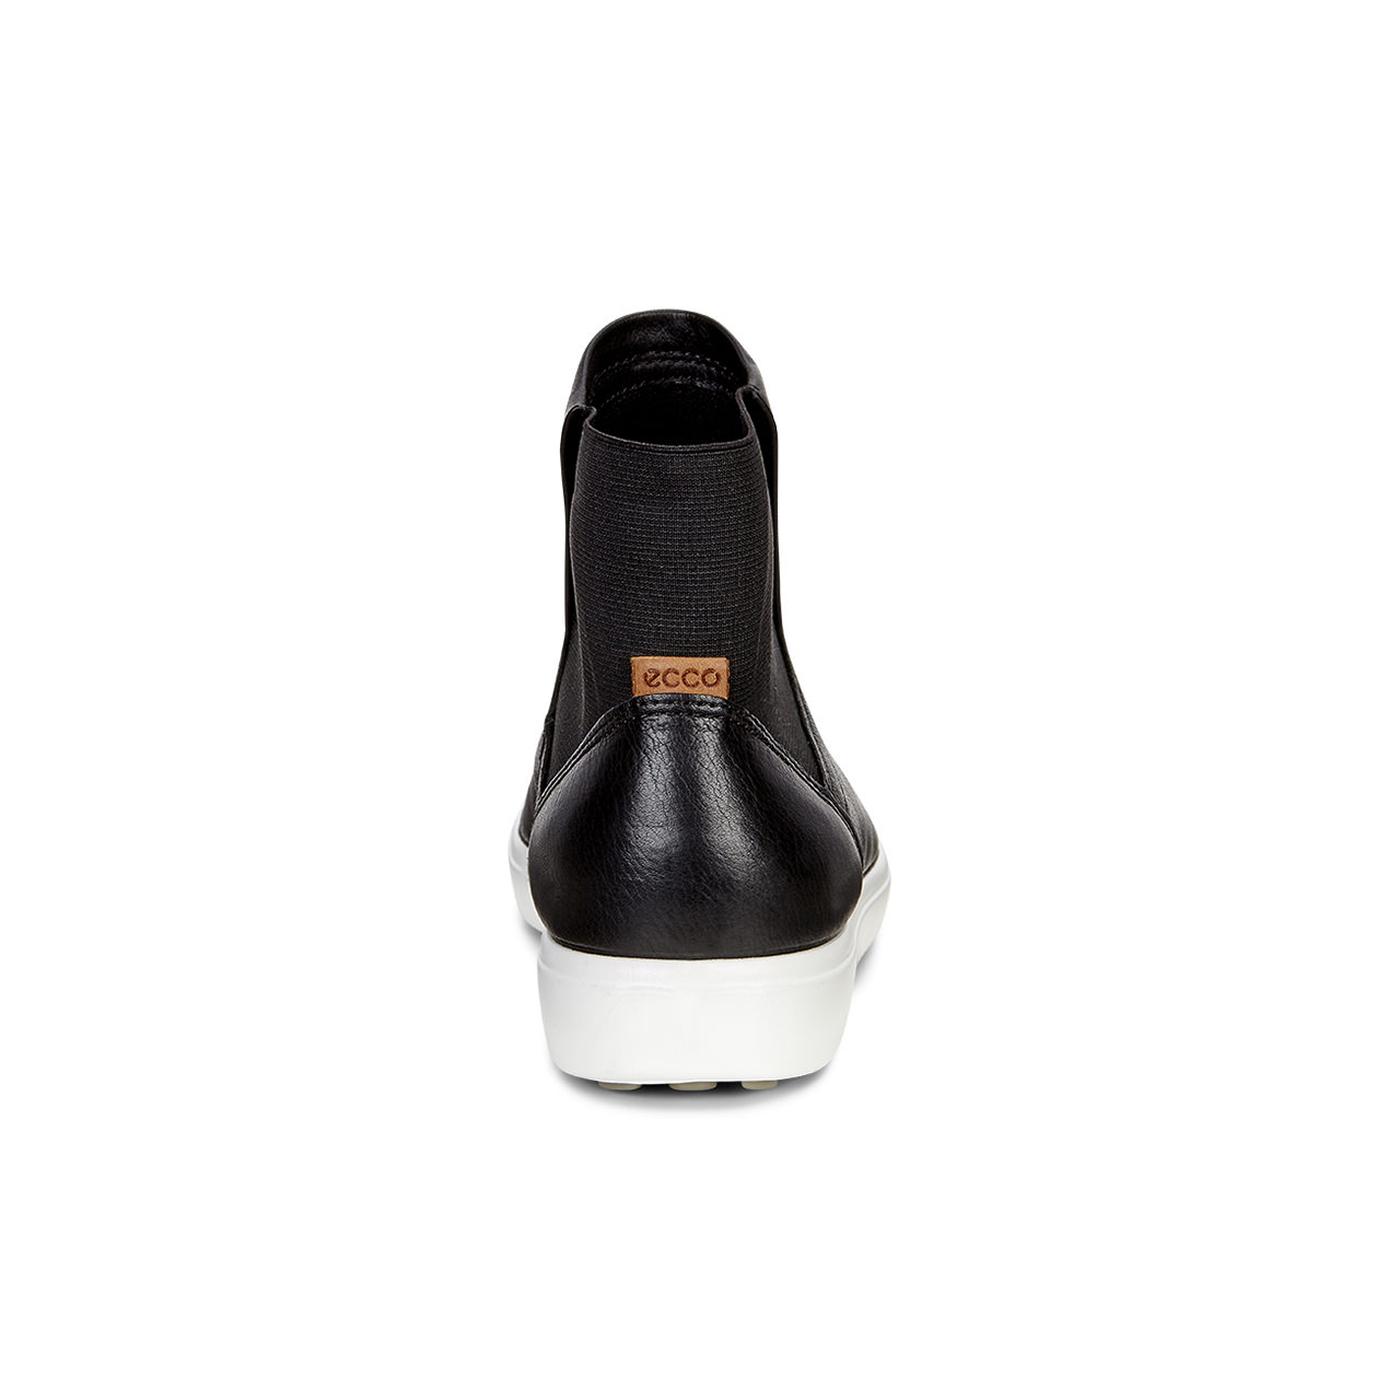 6a1ea9597debb ECCO Women's Soft 7 Bootie | Women's Boots | ECCO® Shoes